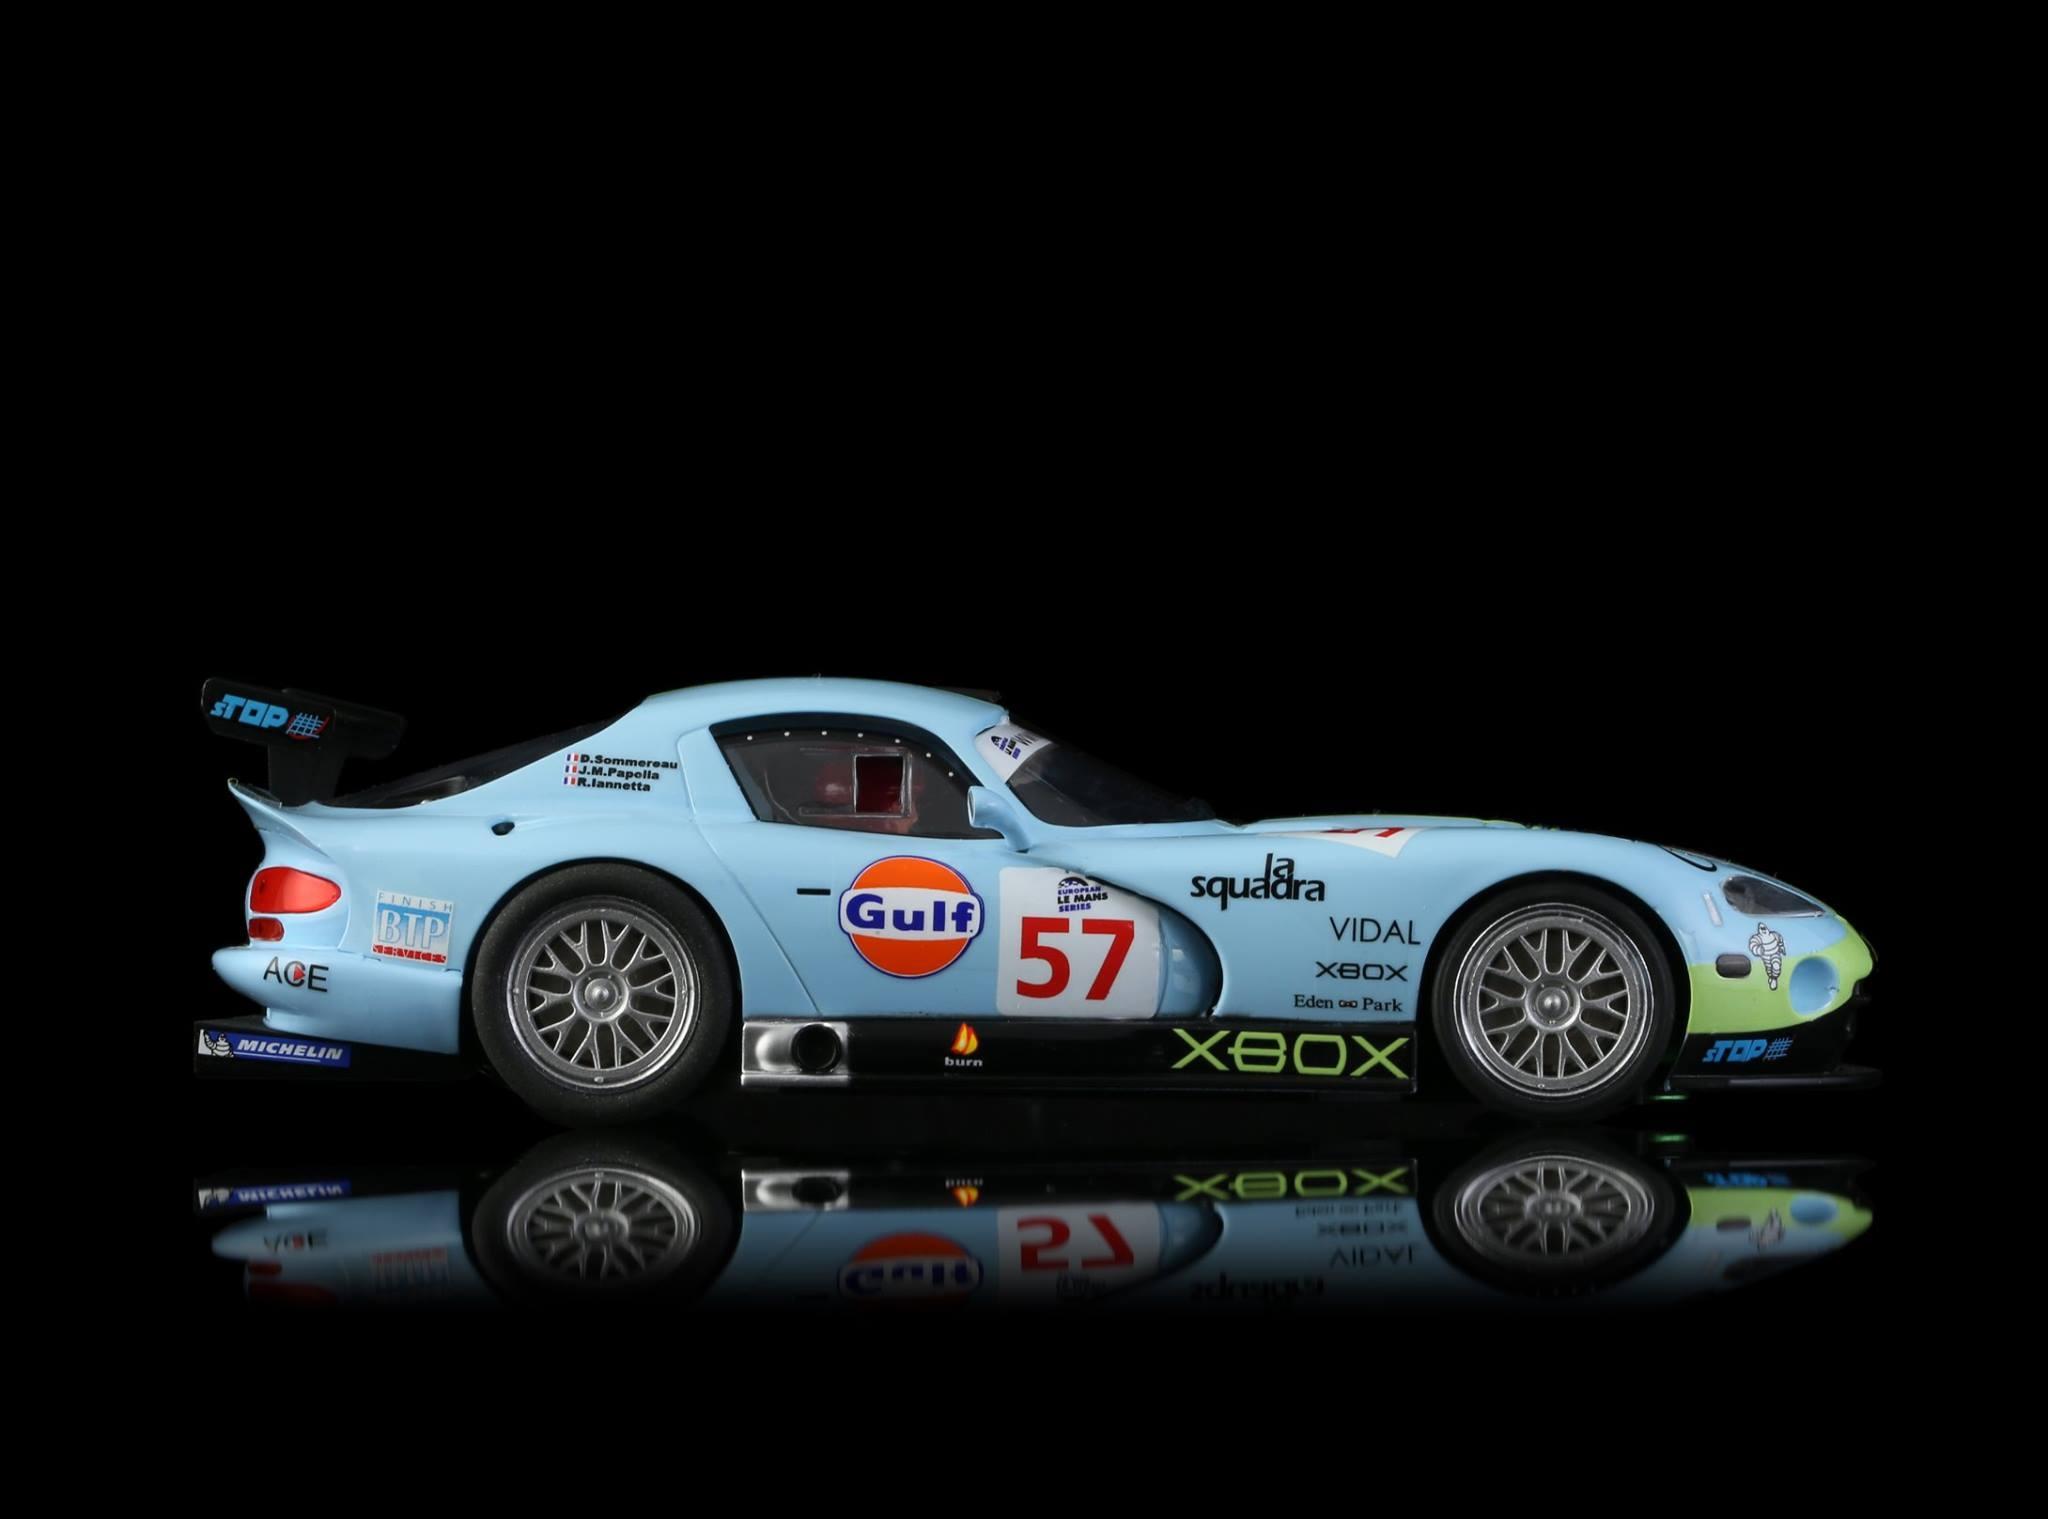 Viper GTS - Paul Belmondo Racing - Gulf #57